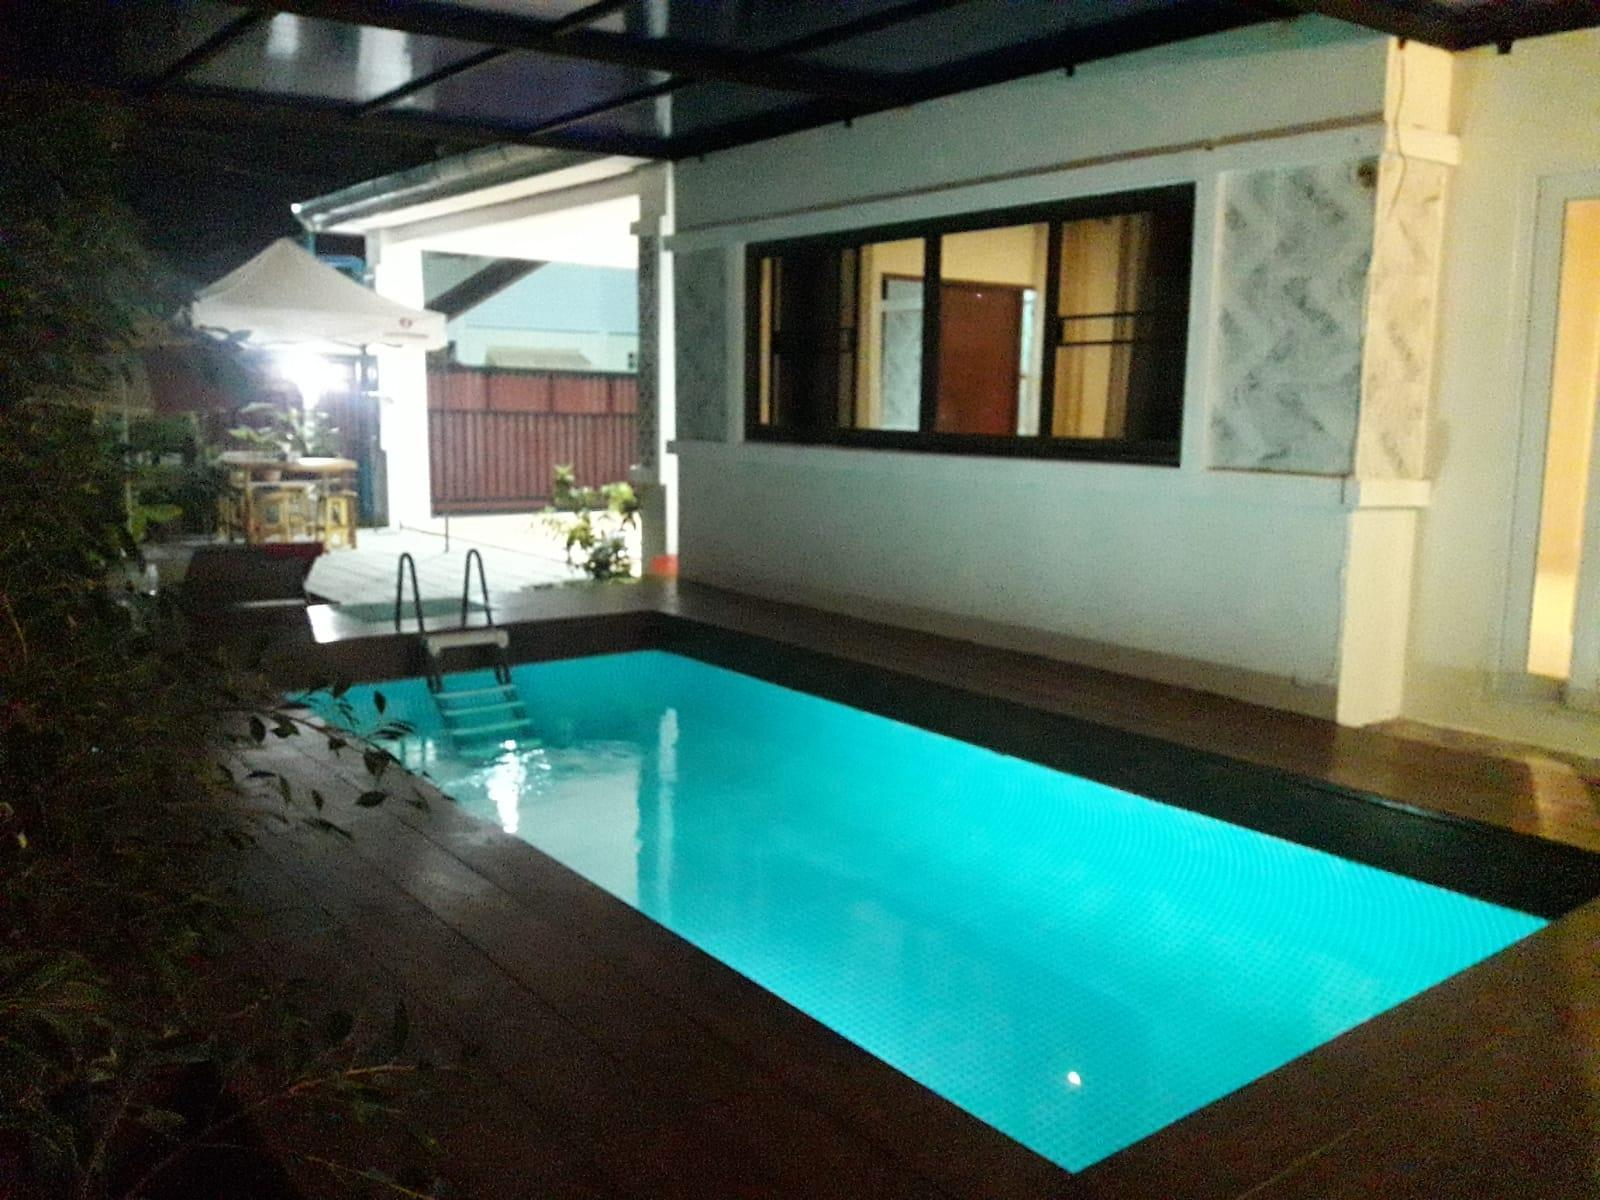 Baan Samkong Pool House